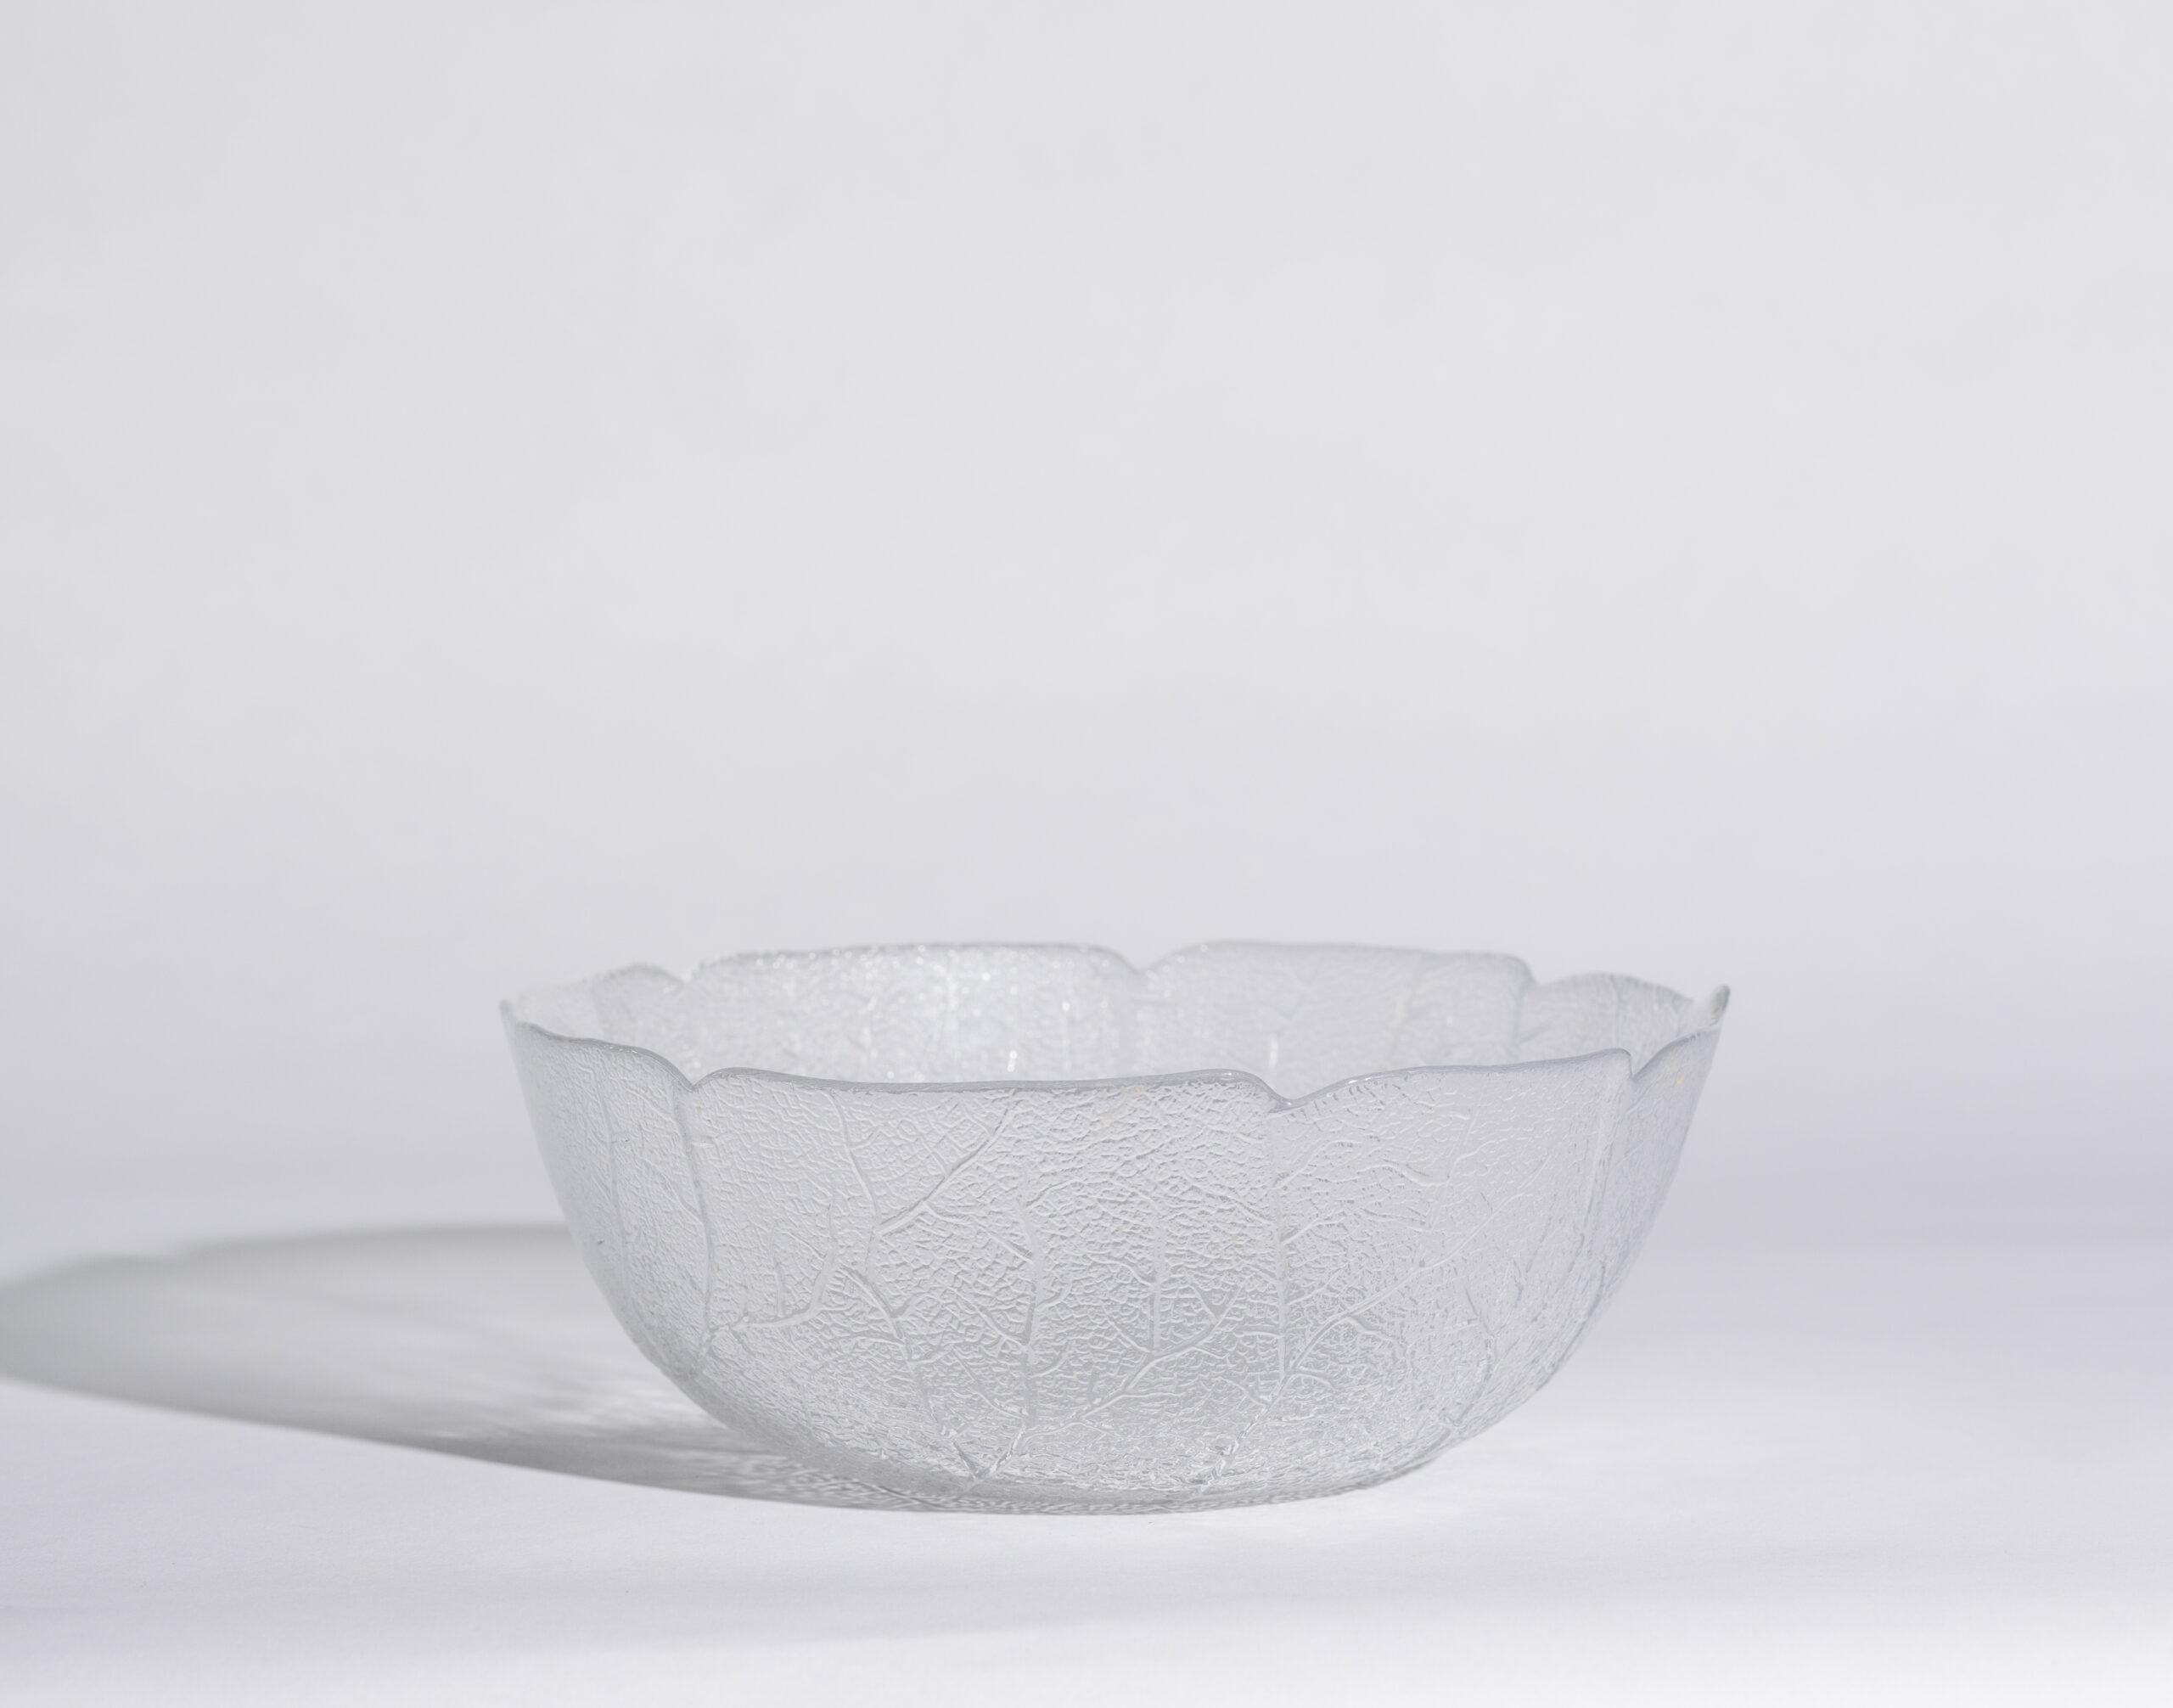 Salad bowl (9'', round, glass)